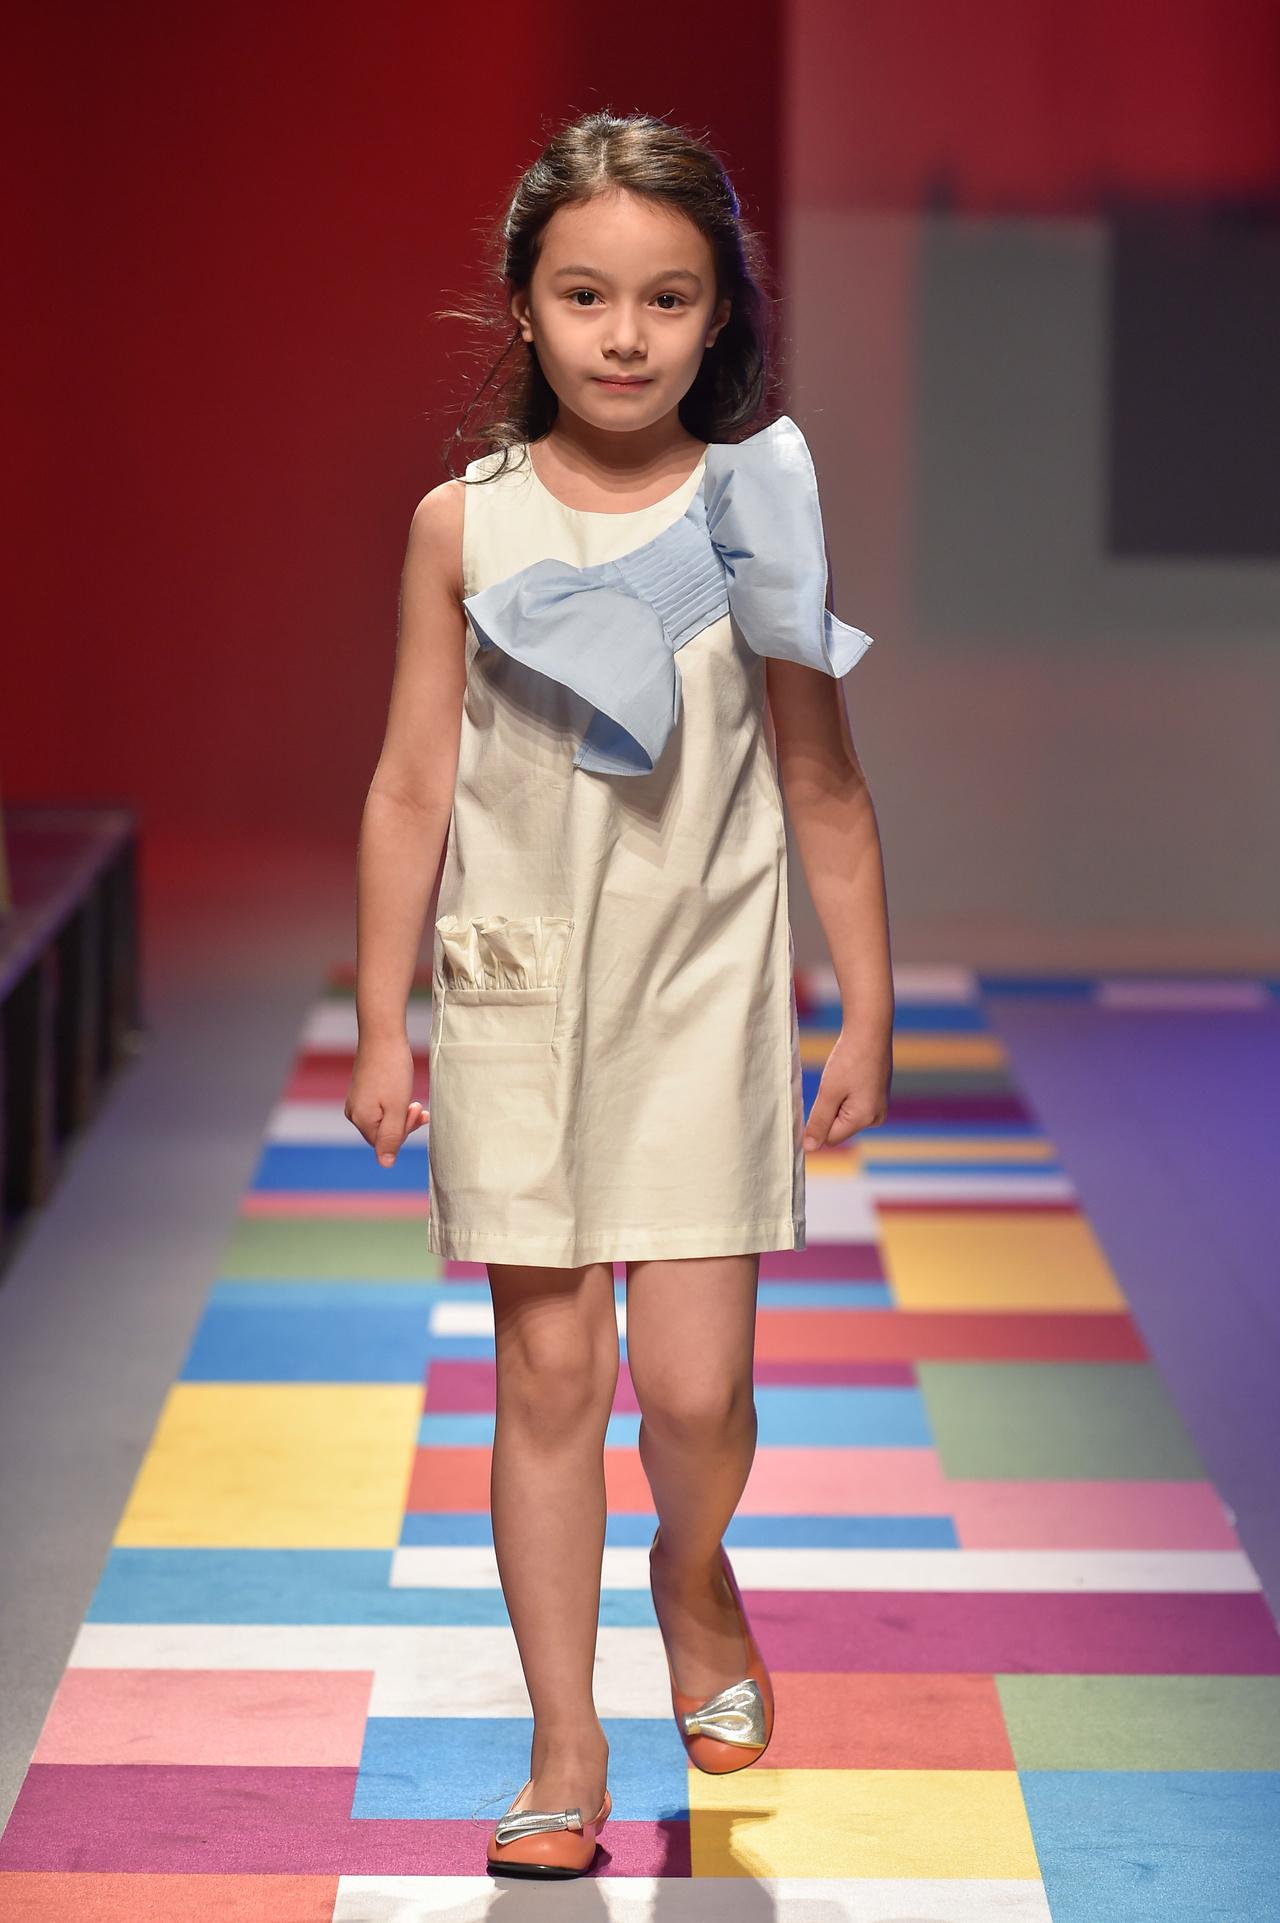 Copy of Reese Dress.JPG